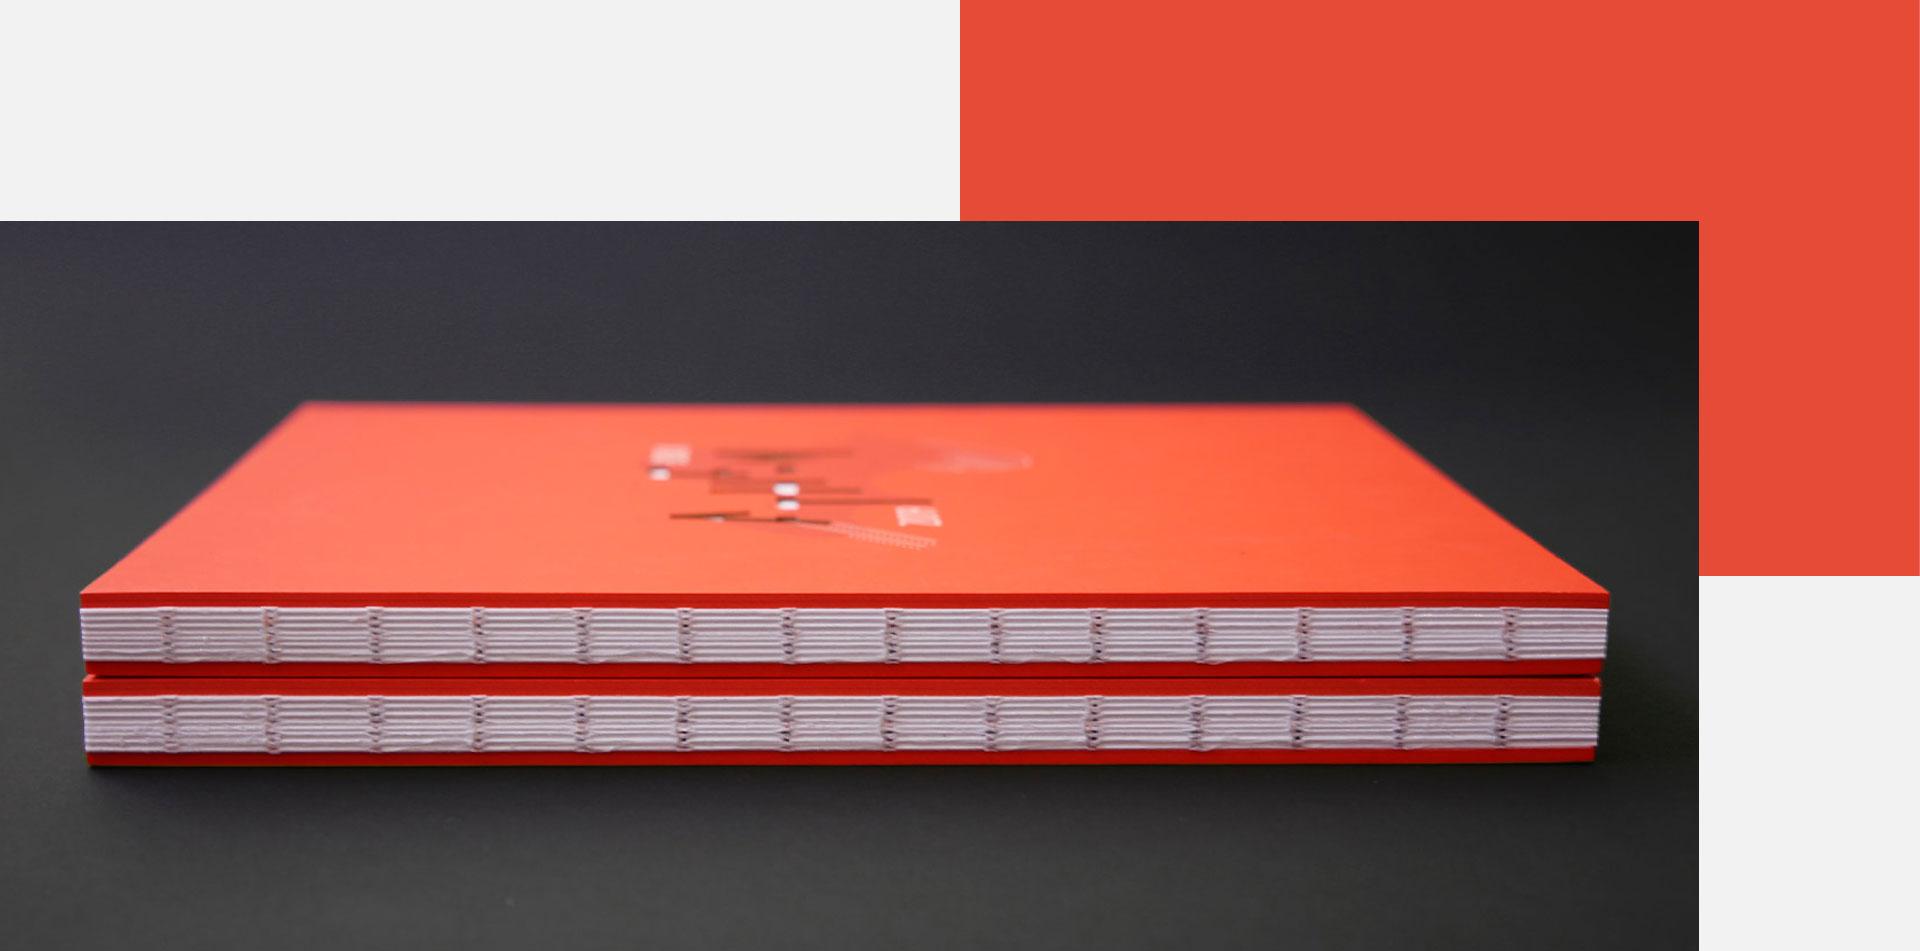 Athem-epok-design-scenographie-book-couture-apparente